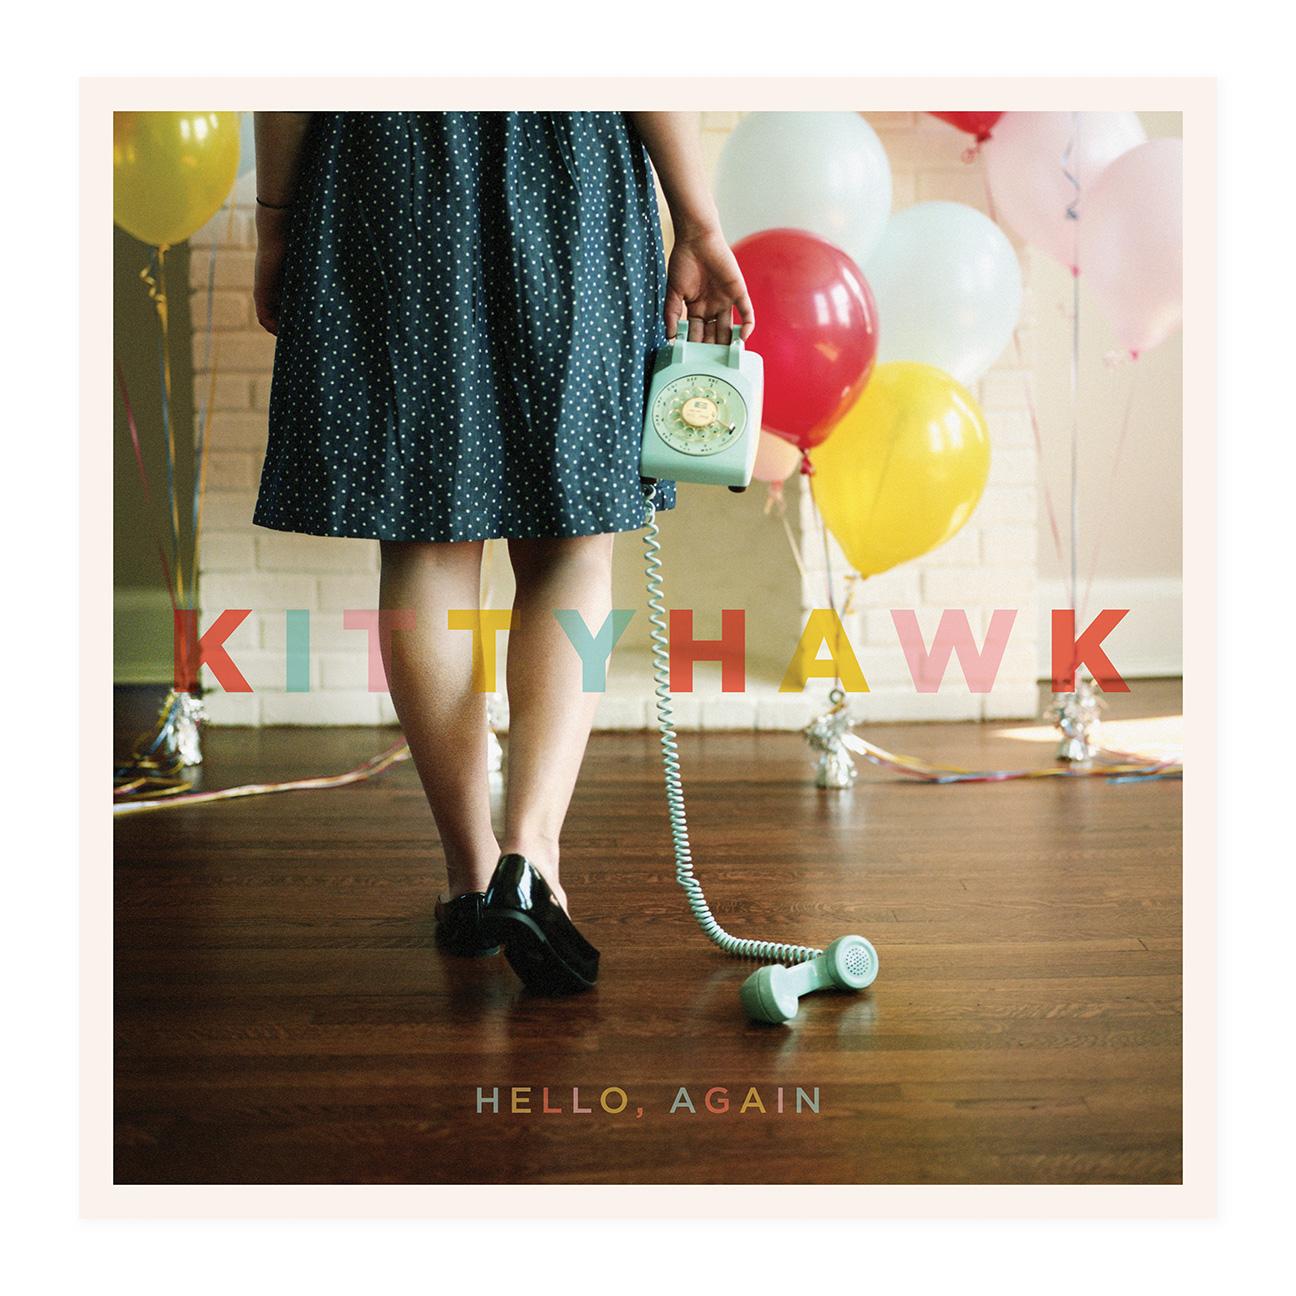 Album-Covers-Kittyhawk-Hello-Again.jpg